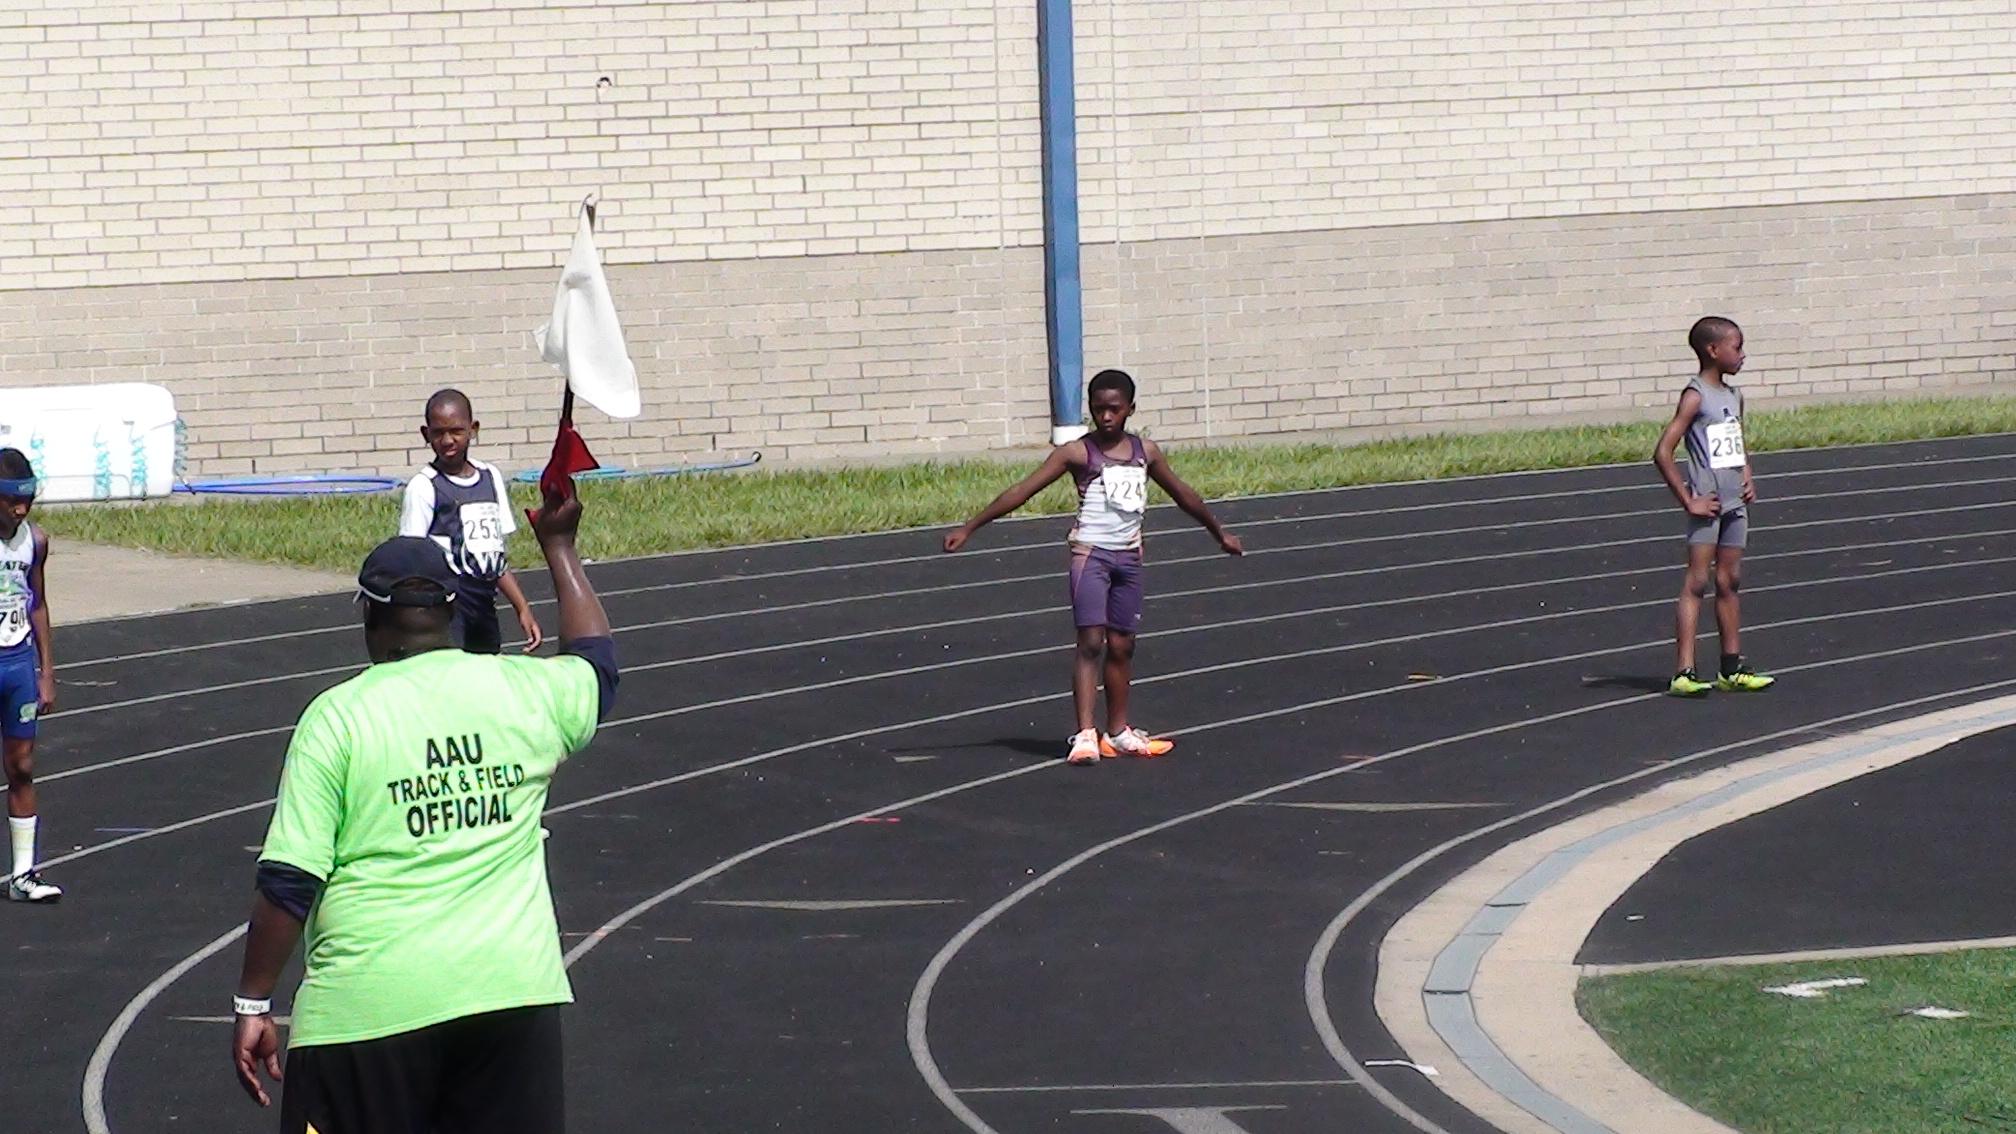 Damario on the 4x100 relay